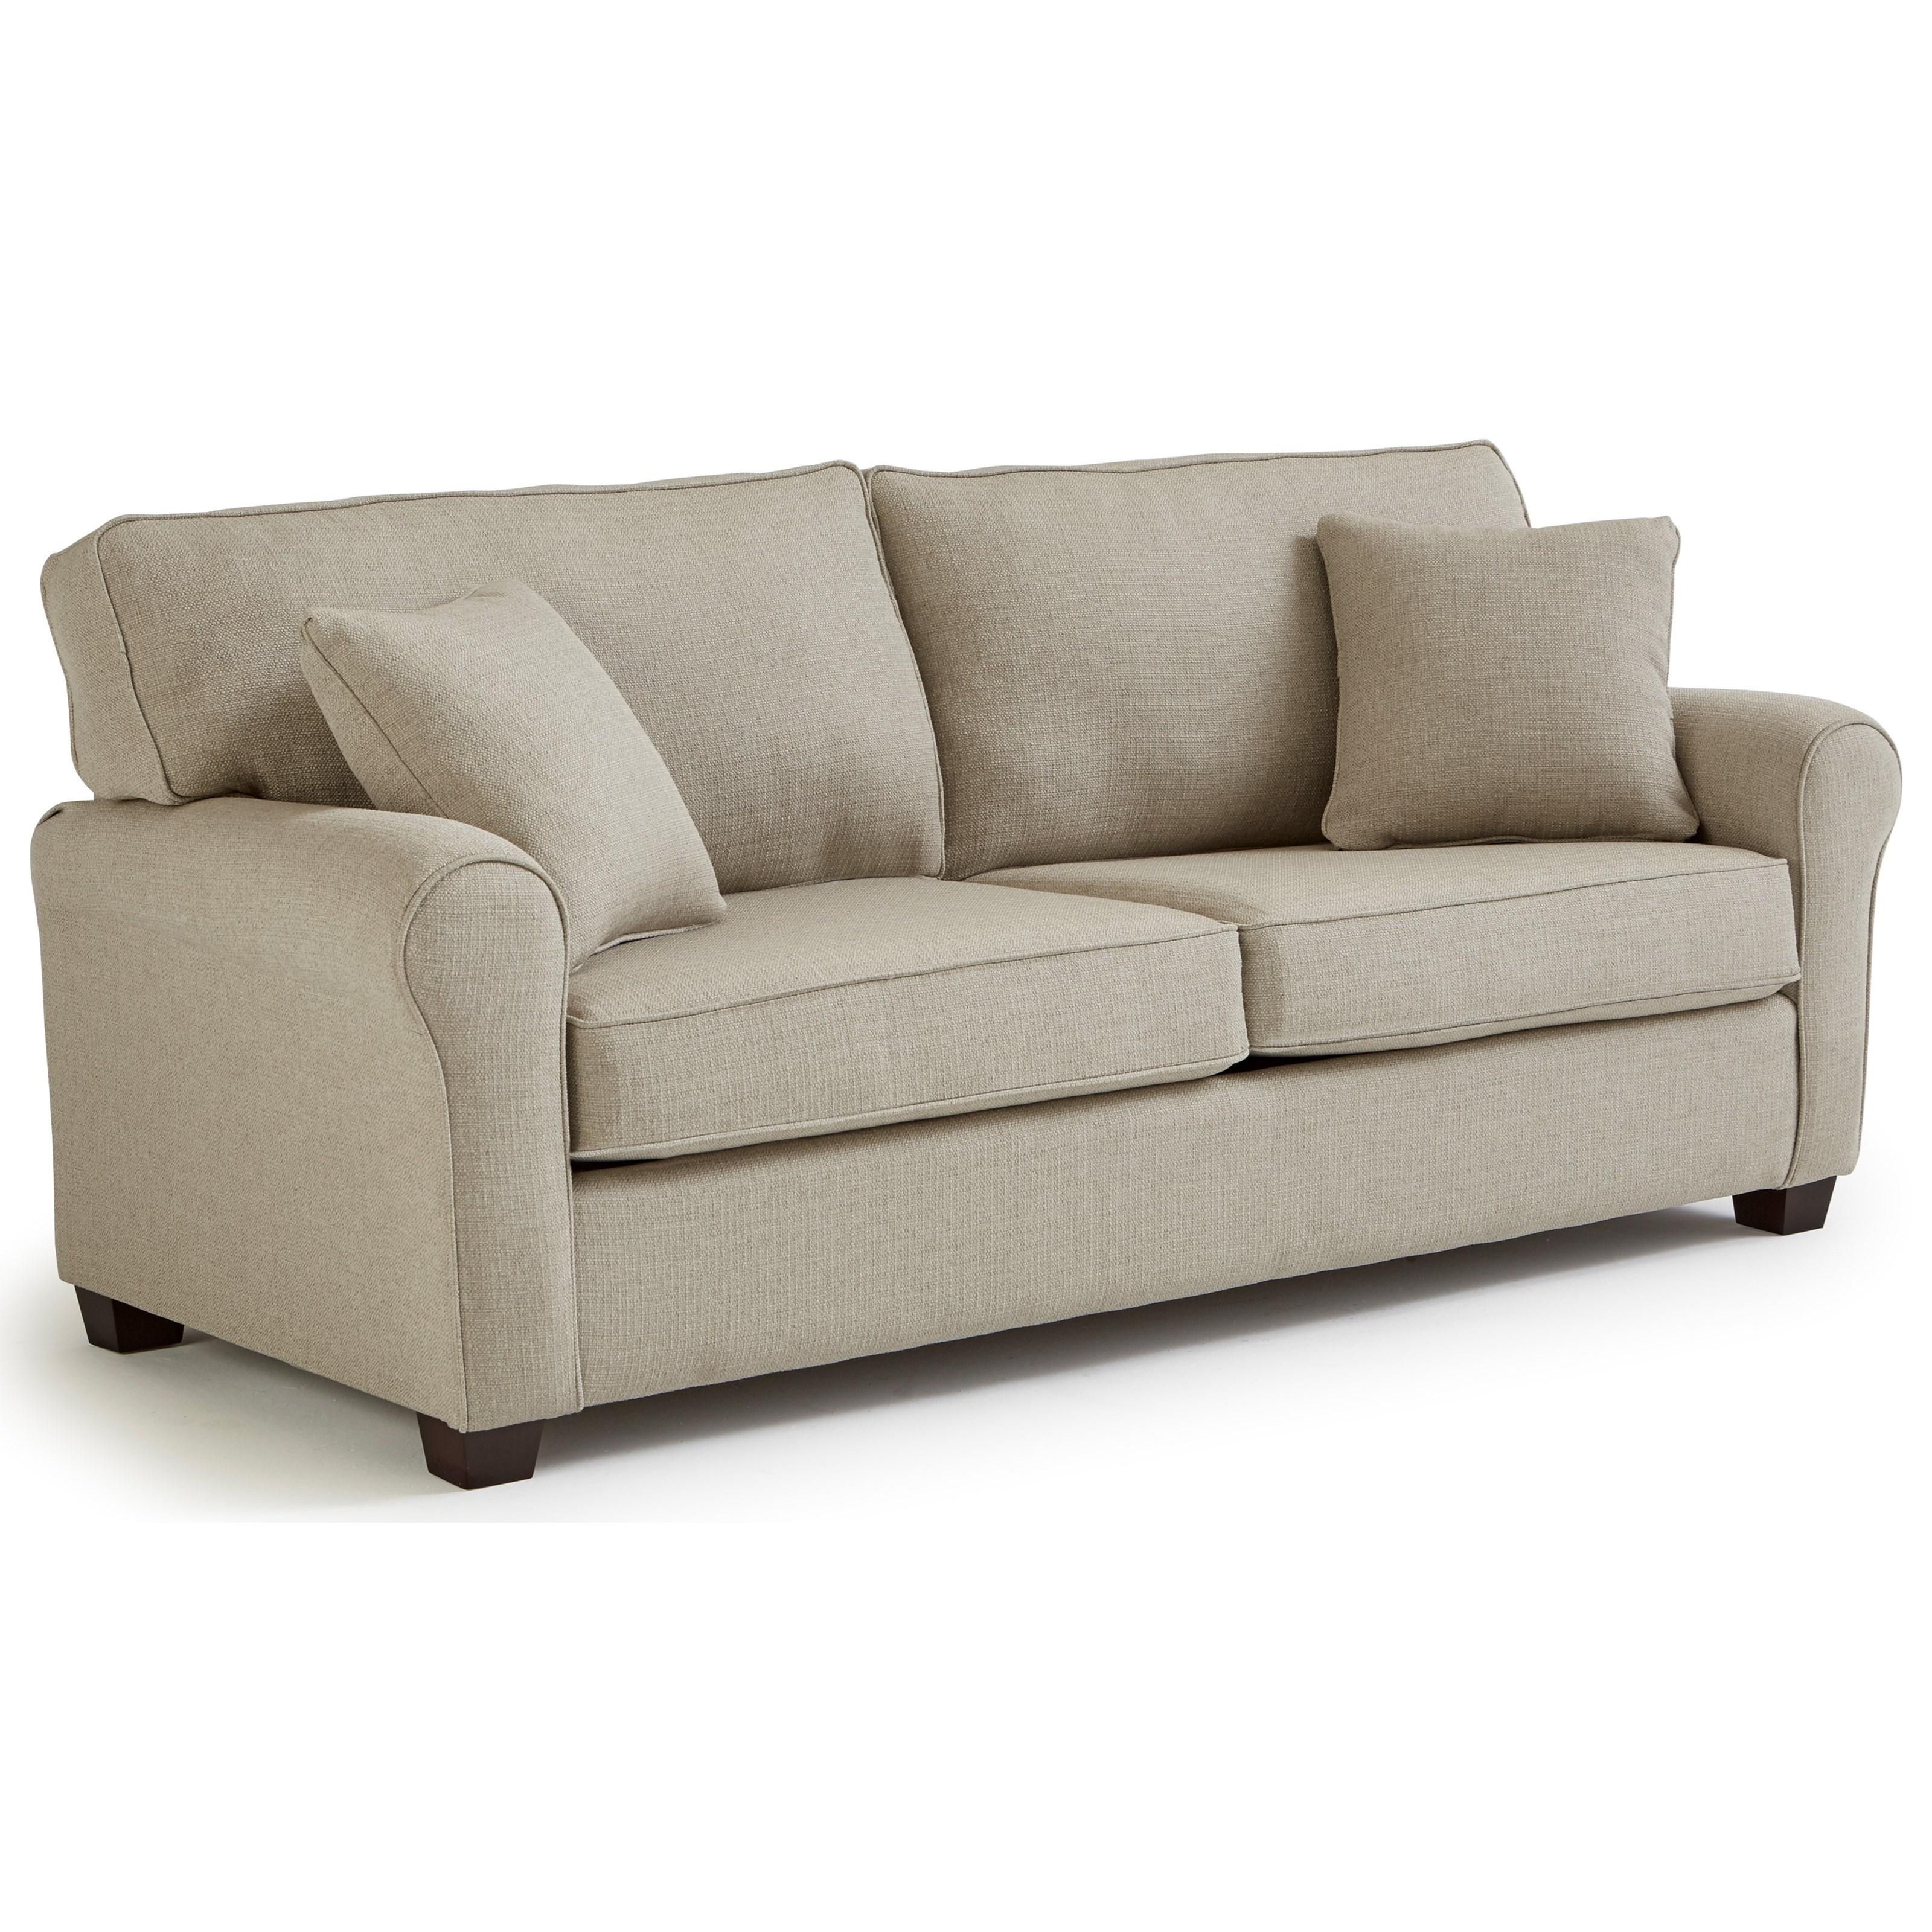 Shannon Queen Sofa Sleeper w/ Memory Foam Mattress by Best Home Furnishings at Saugerties Furniture Mart